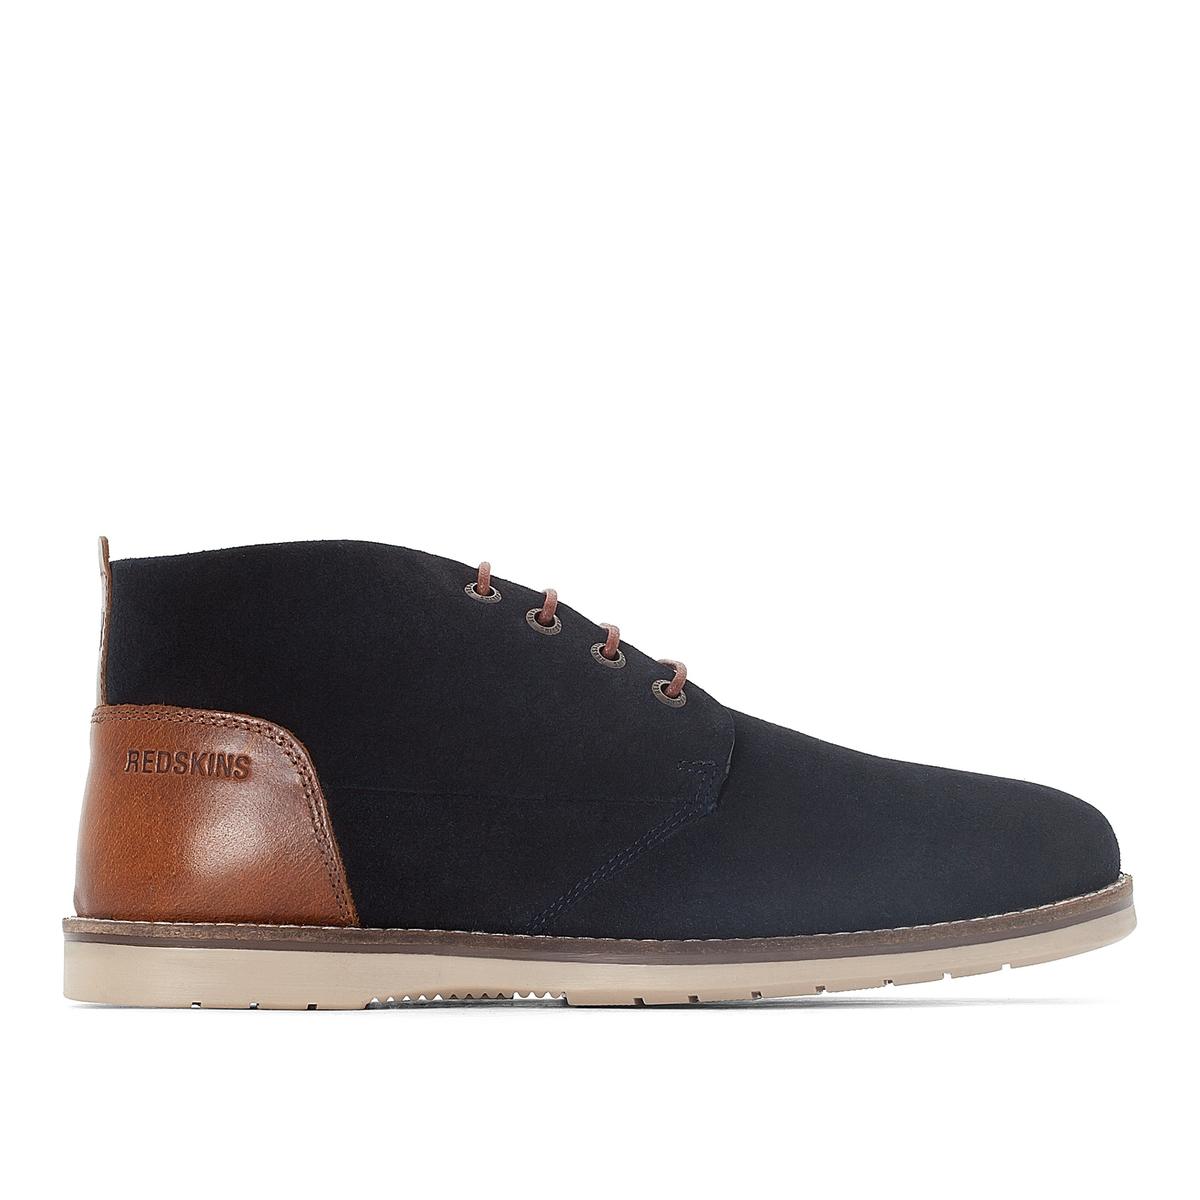 Ботинки-дезерты кожаные BALMON RedSkins